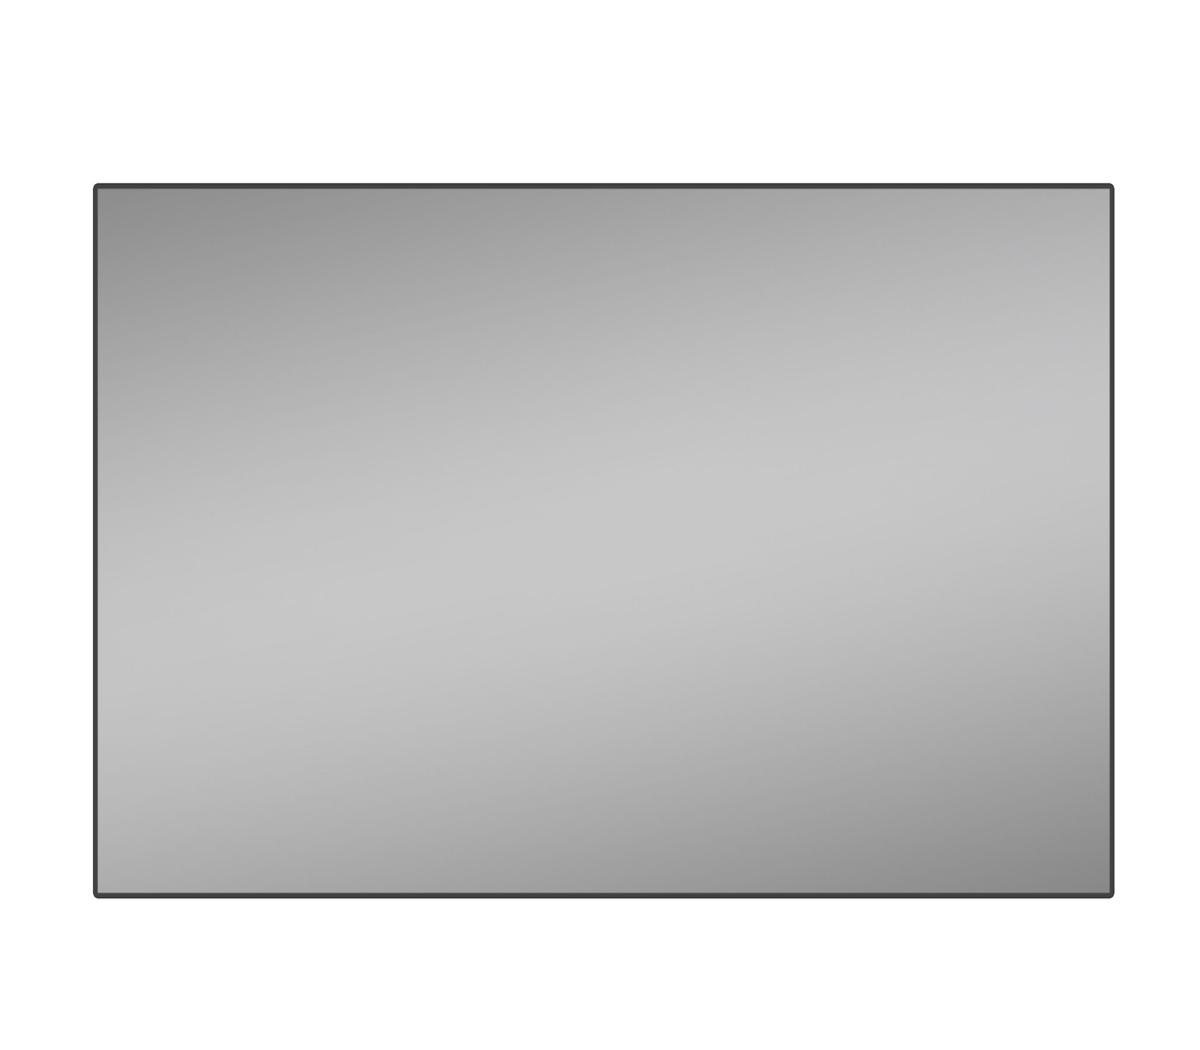 Grandview ALR Ultra Short Throw Fixed Frame Projector Screen